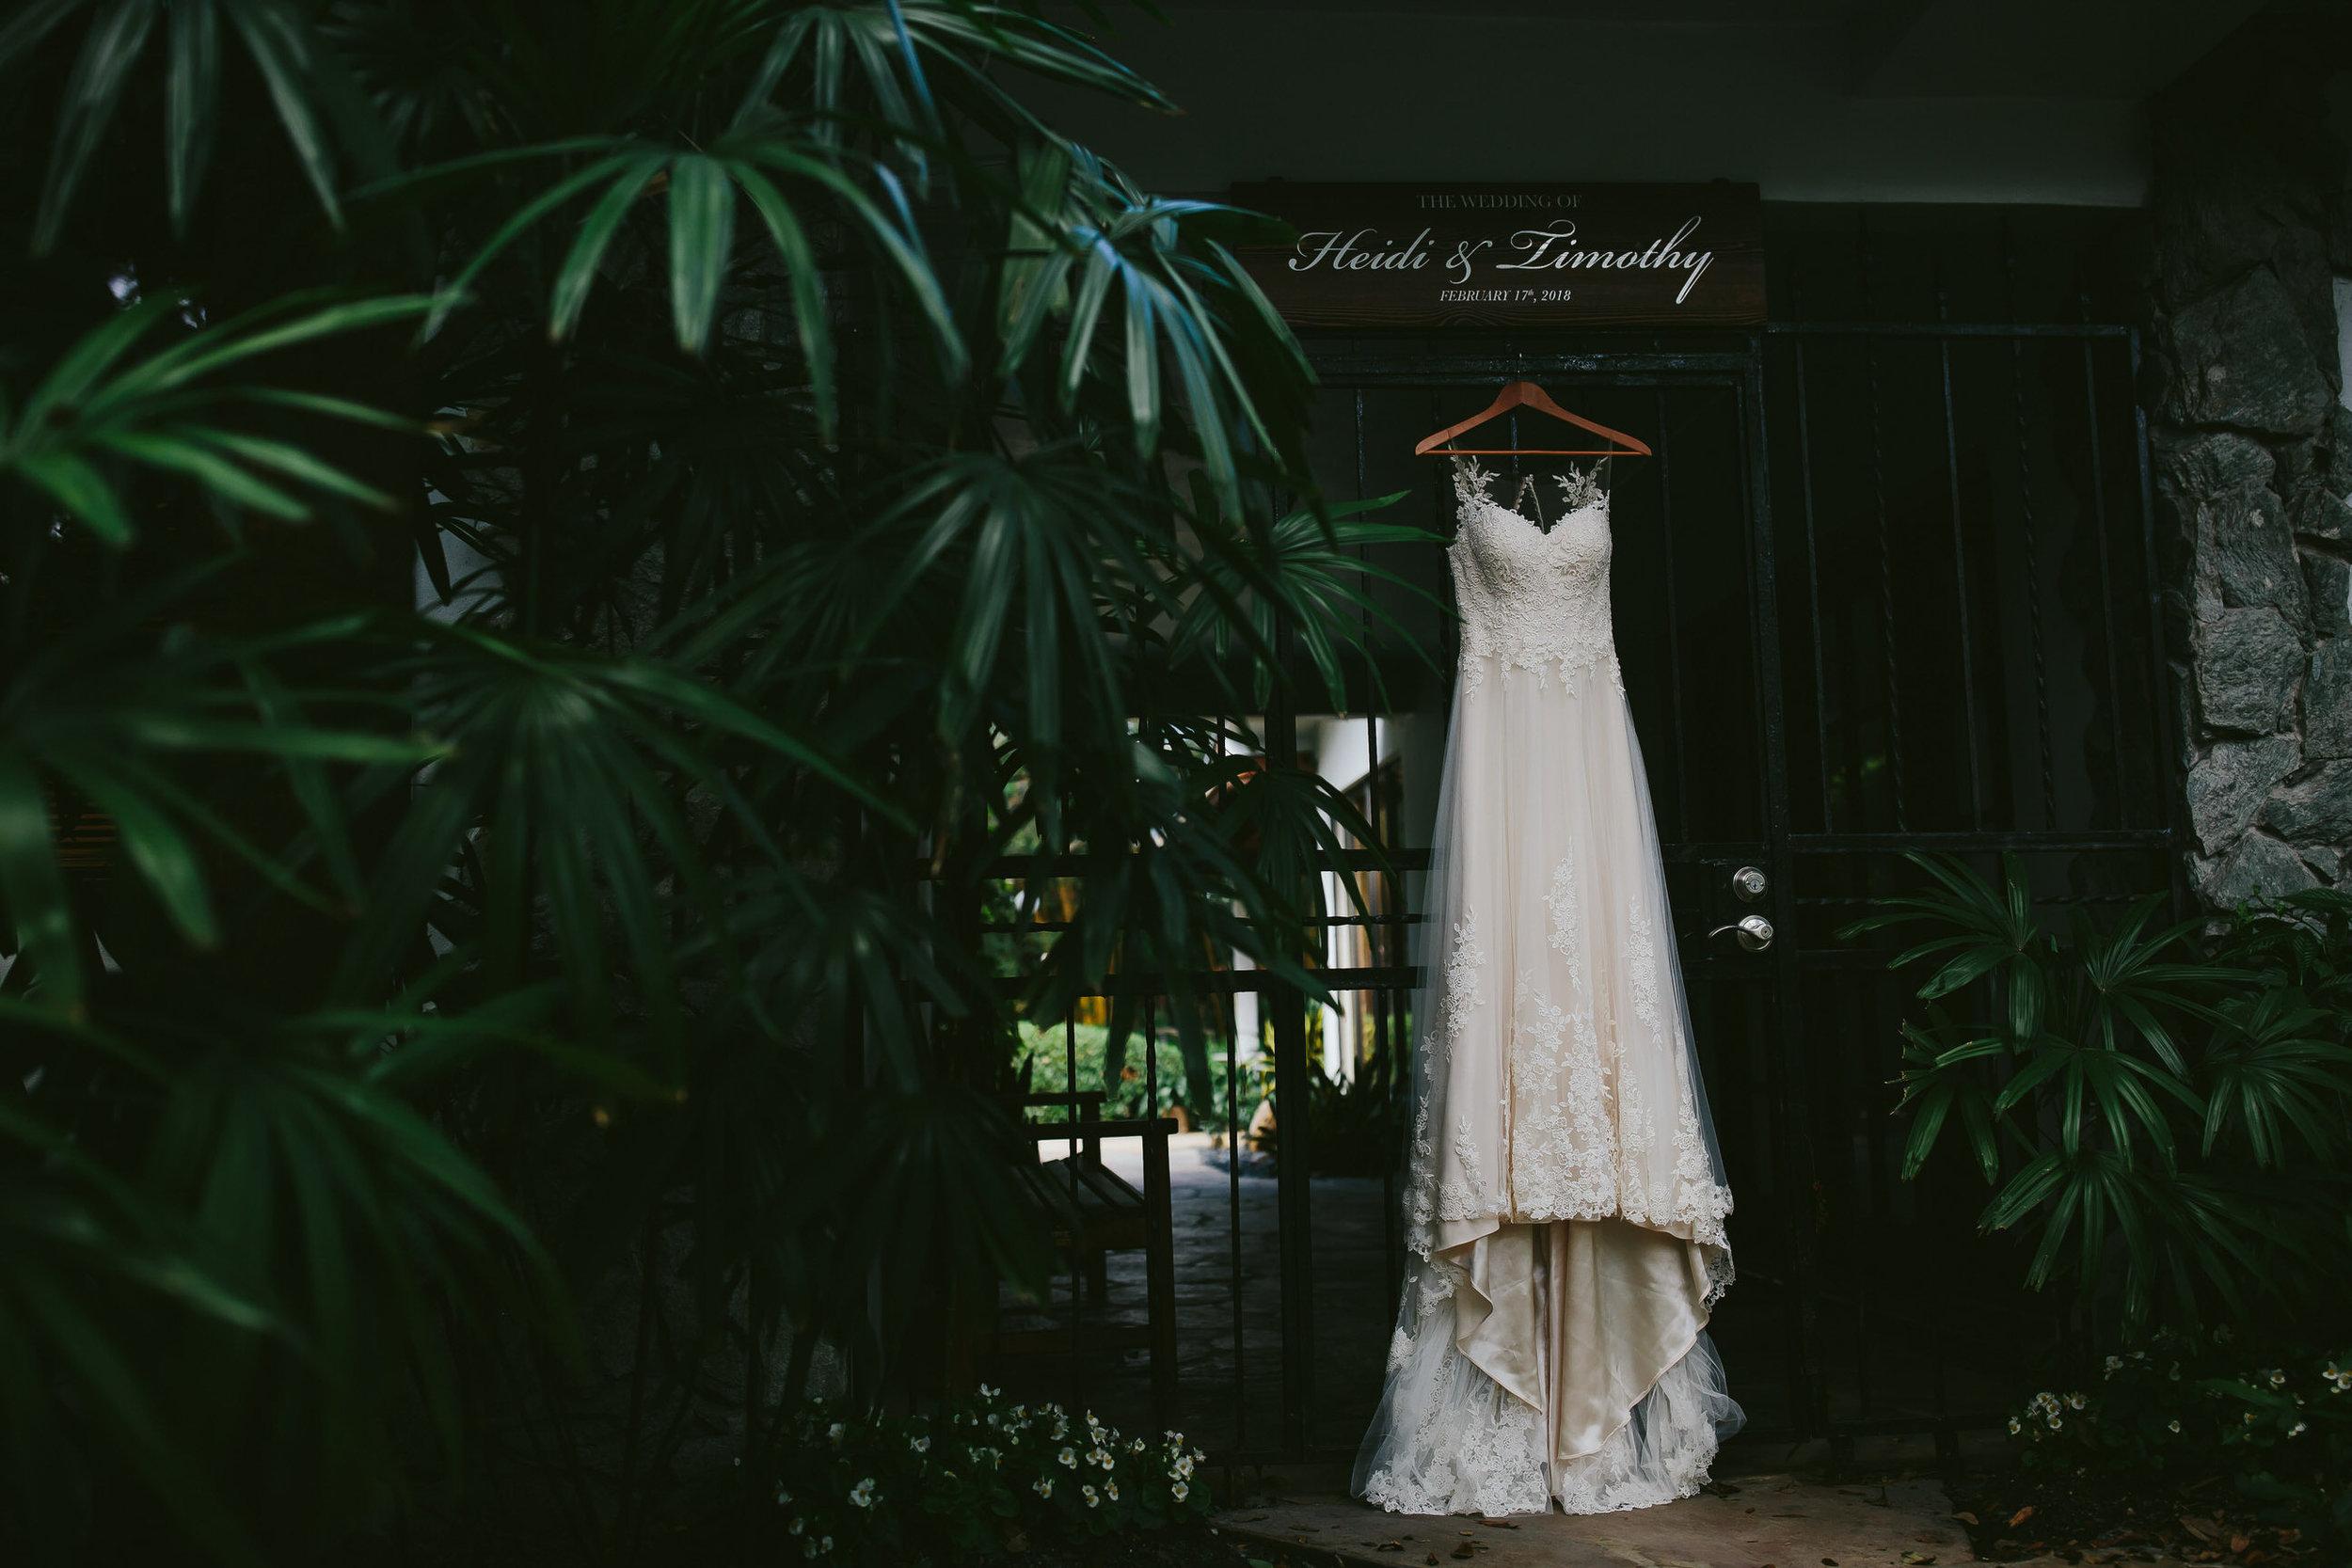 gorgeous_dress_wedding_photography_tiny_house_photo_destination_travel_san_francisco_bay_area.jpg